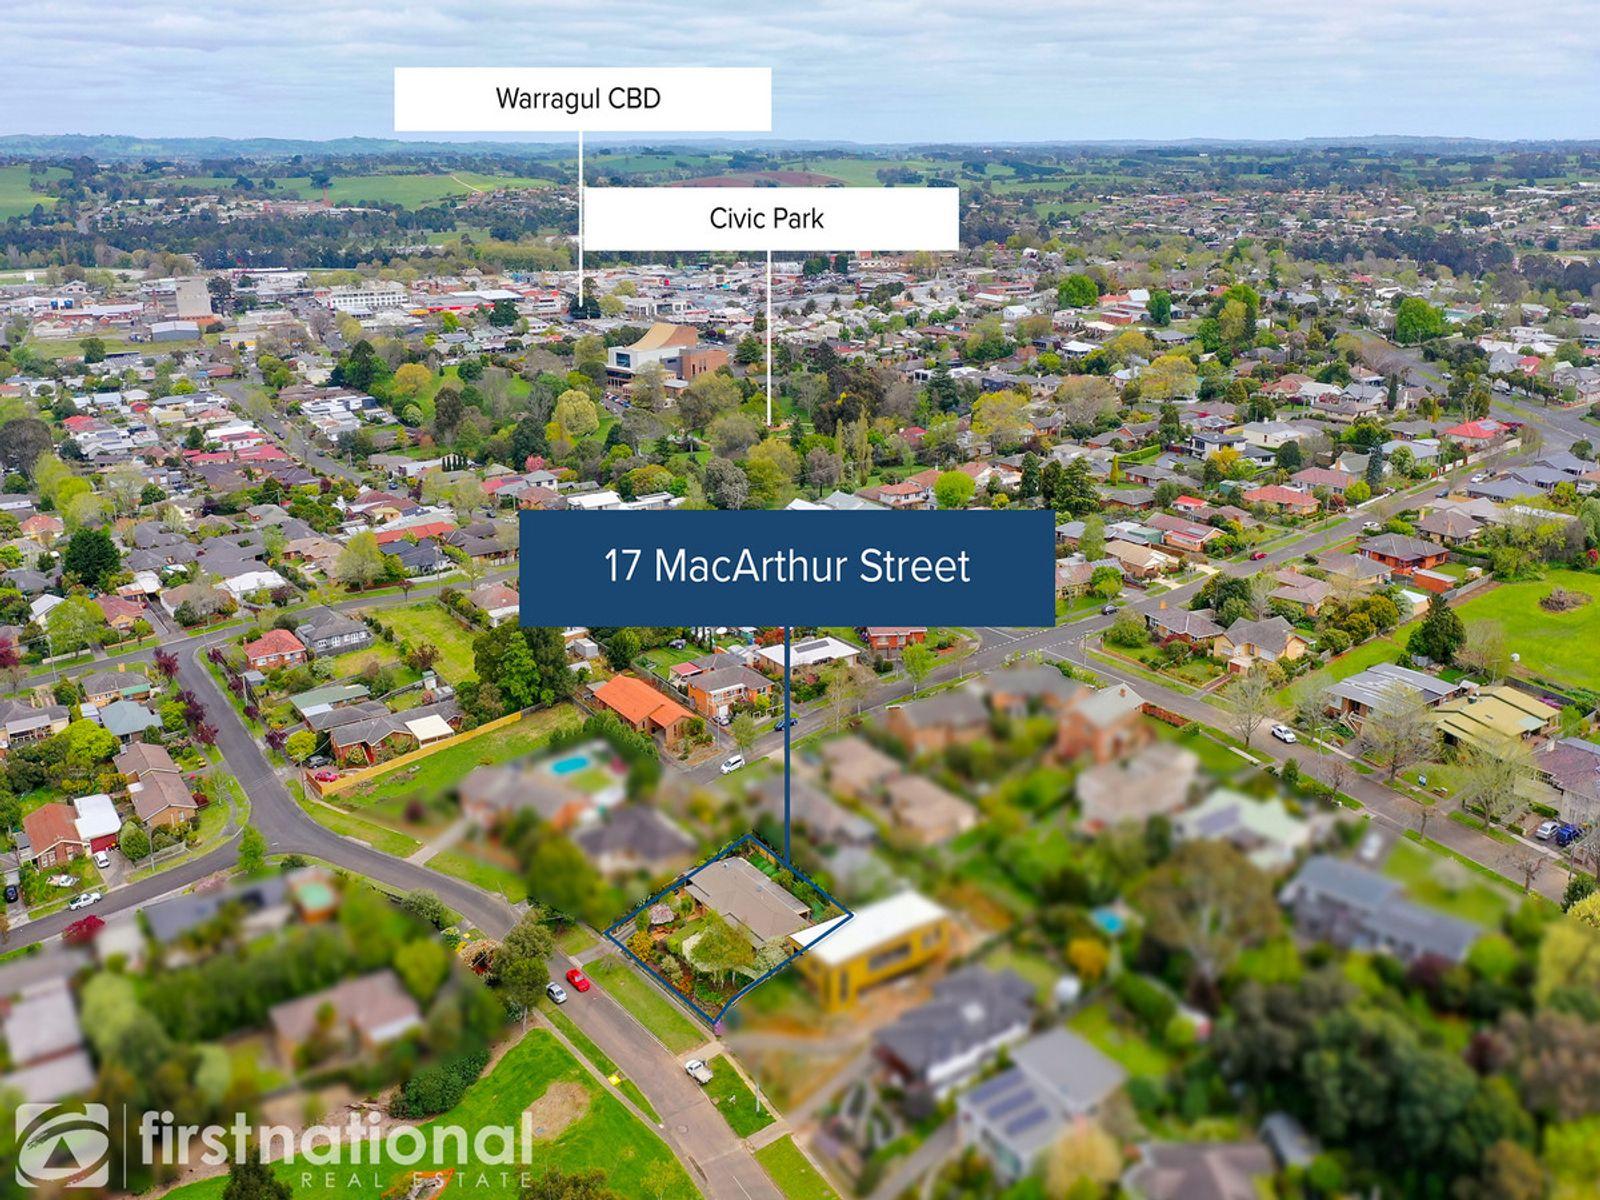 17 MacArthur Street, Warragul, VIC 3820